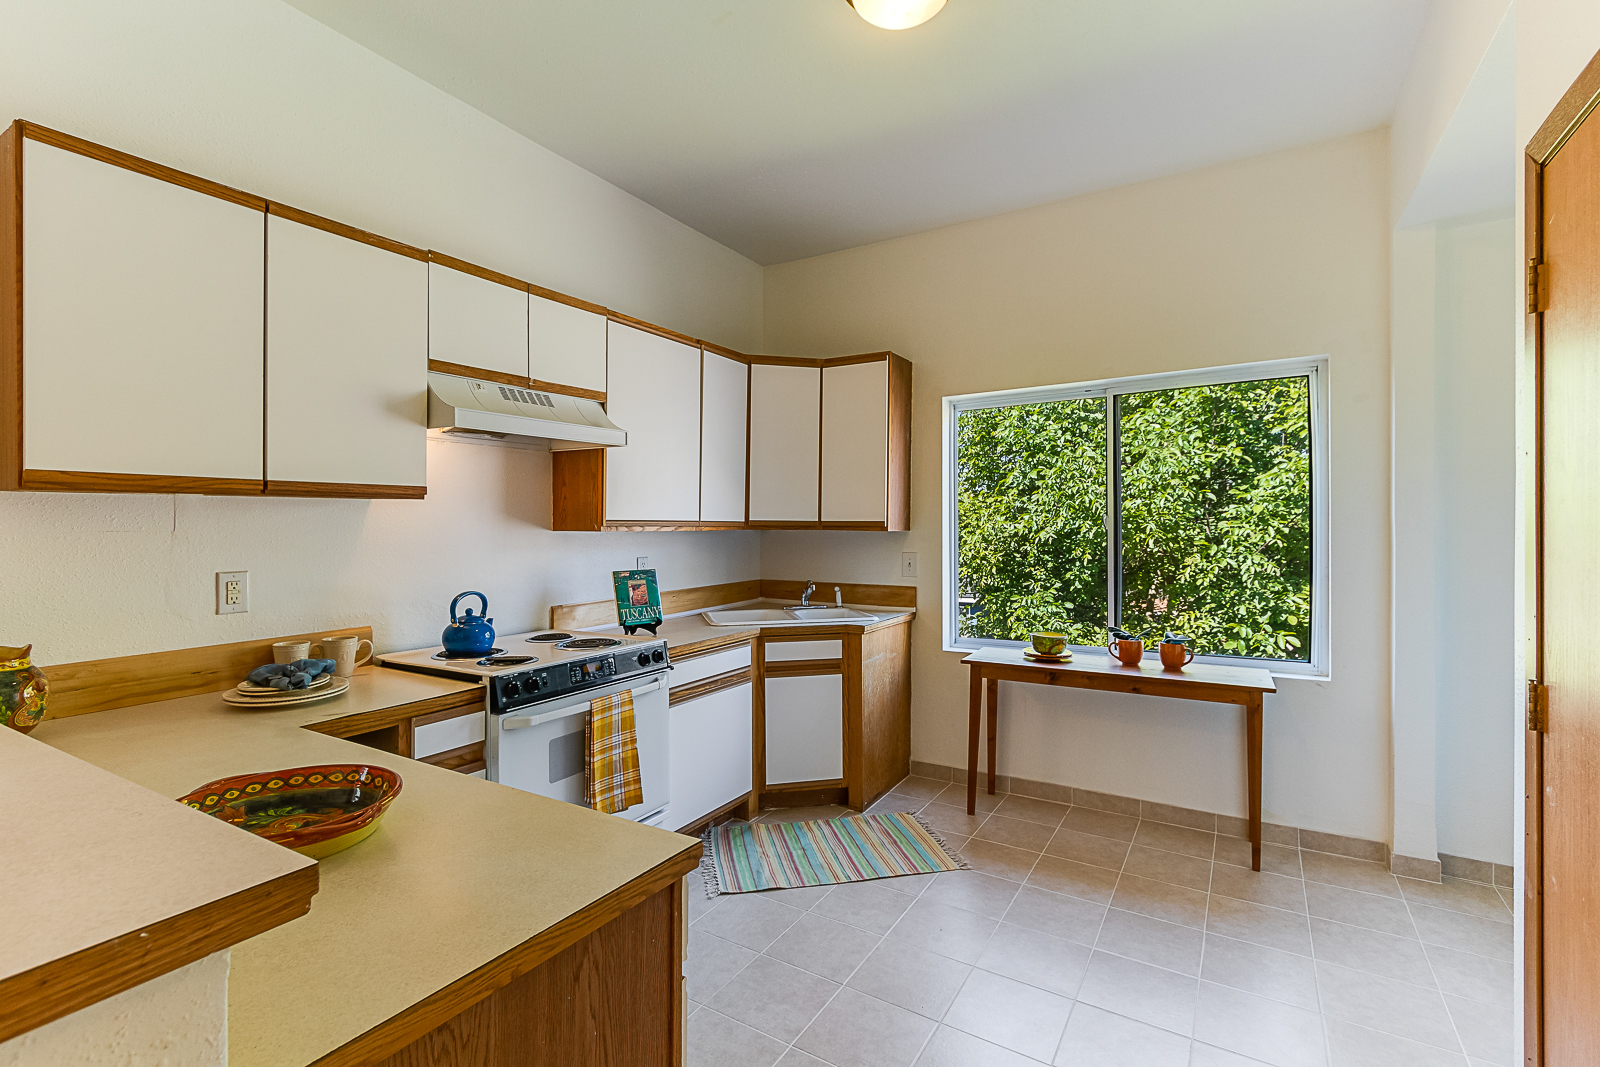 kitchen1-7572-PRINTS.jpg